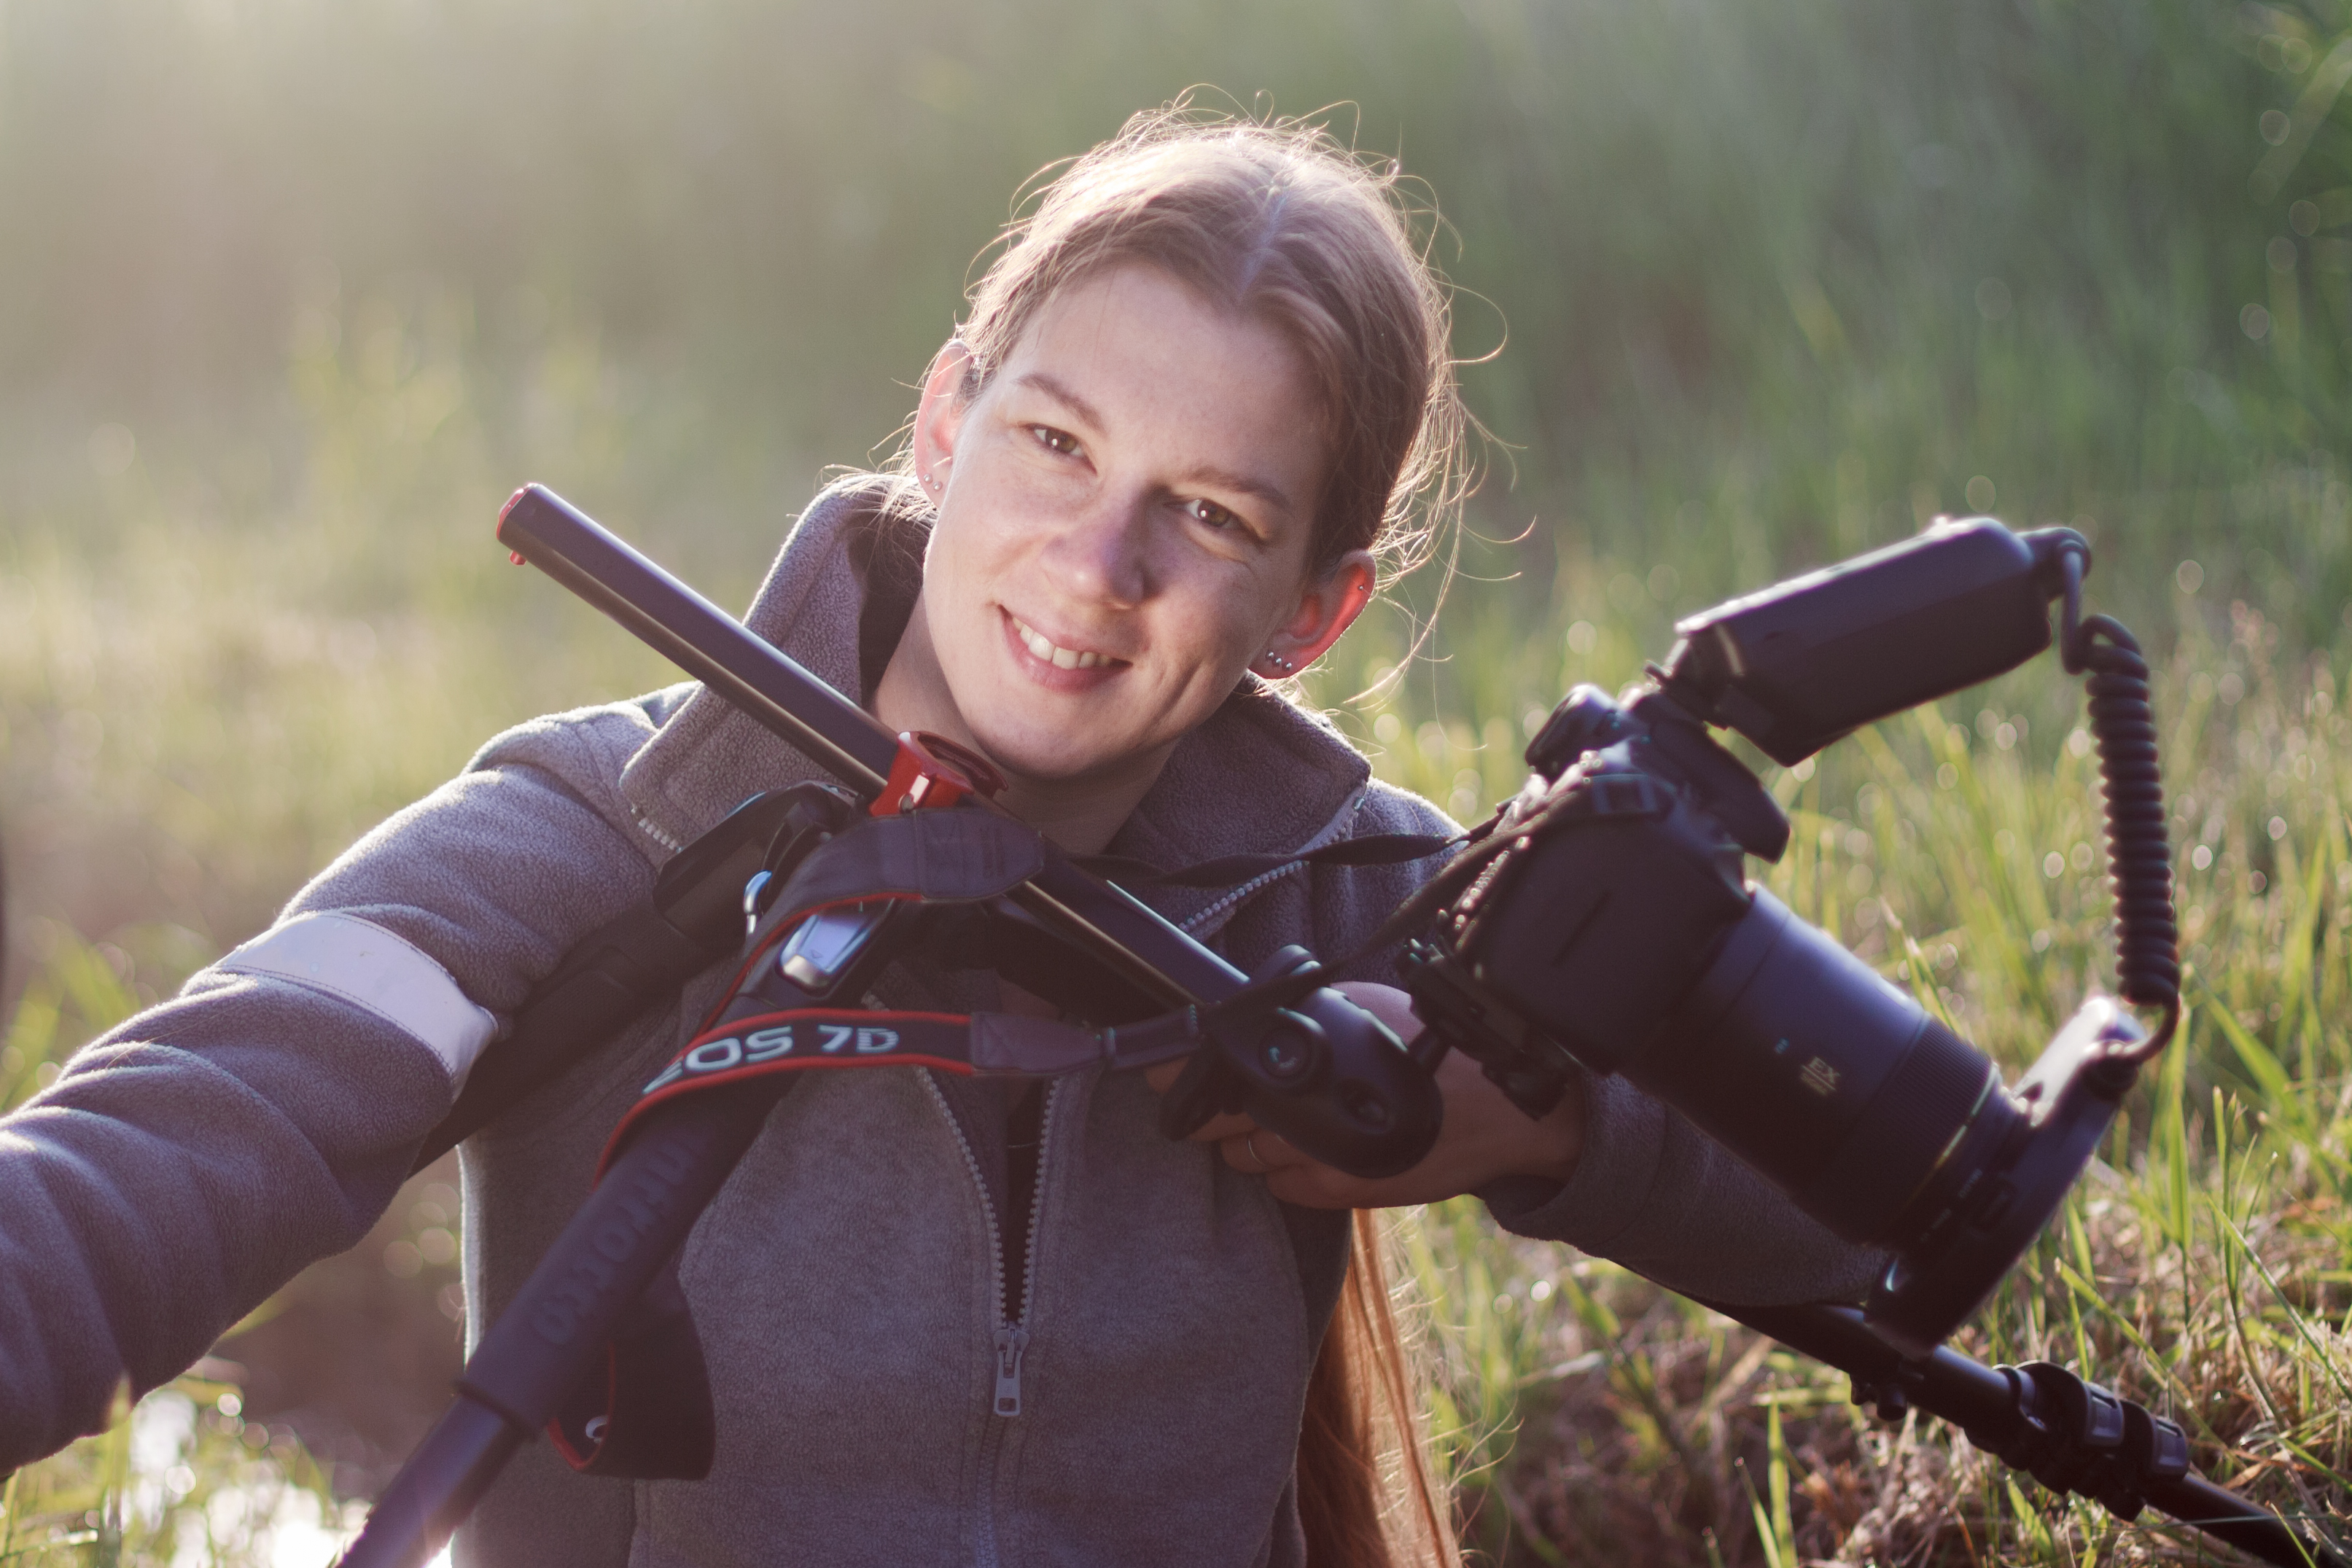 Agata Bednarska i makrofotografia w plenerze